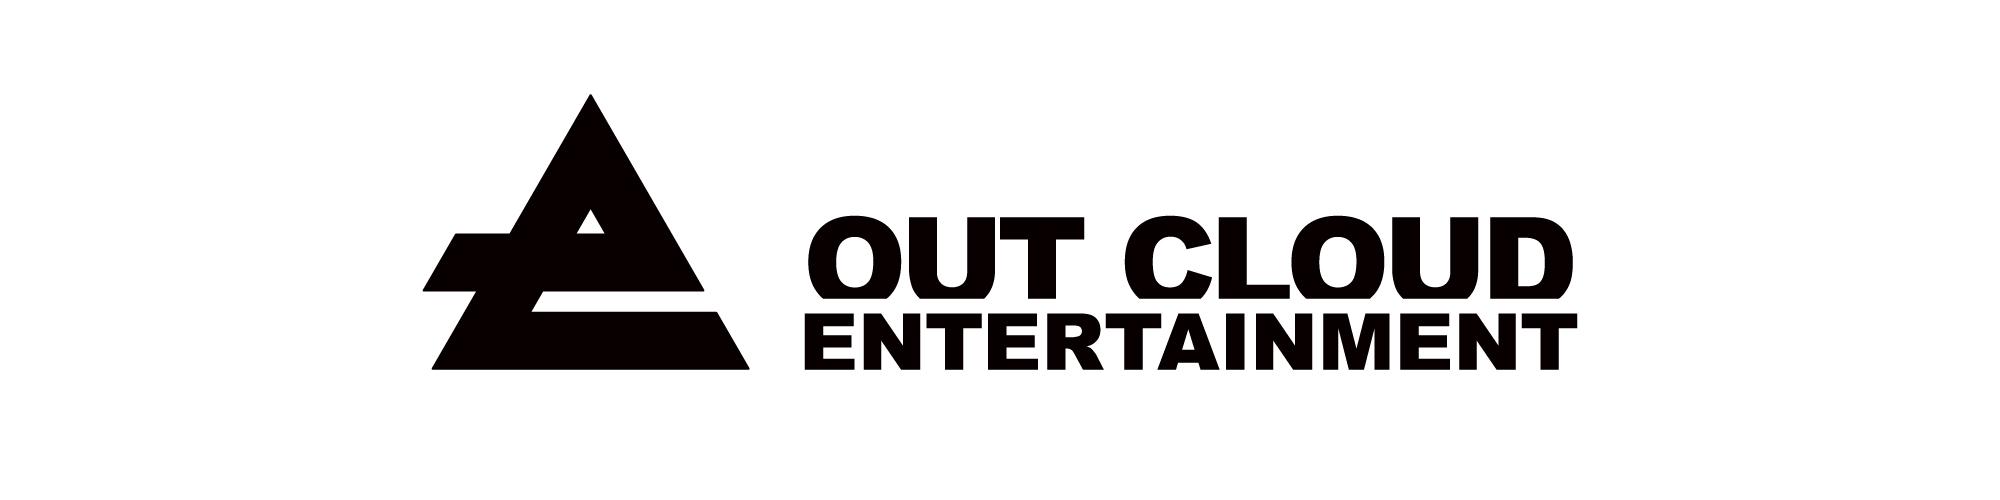 OUT CLOUD ENTERTAINMENT V.I.